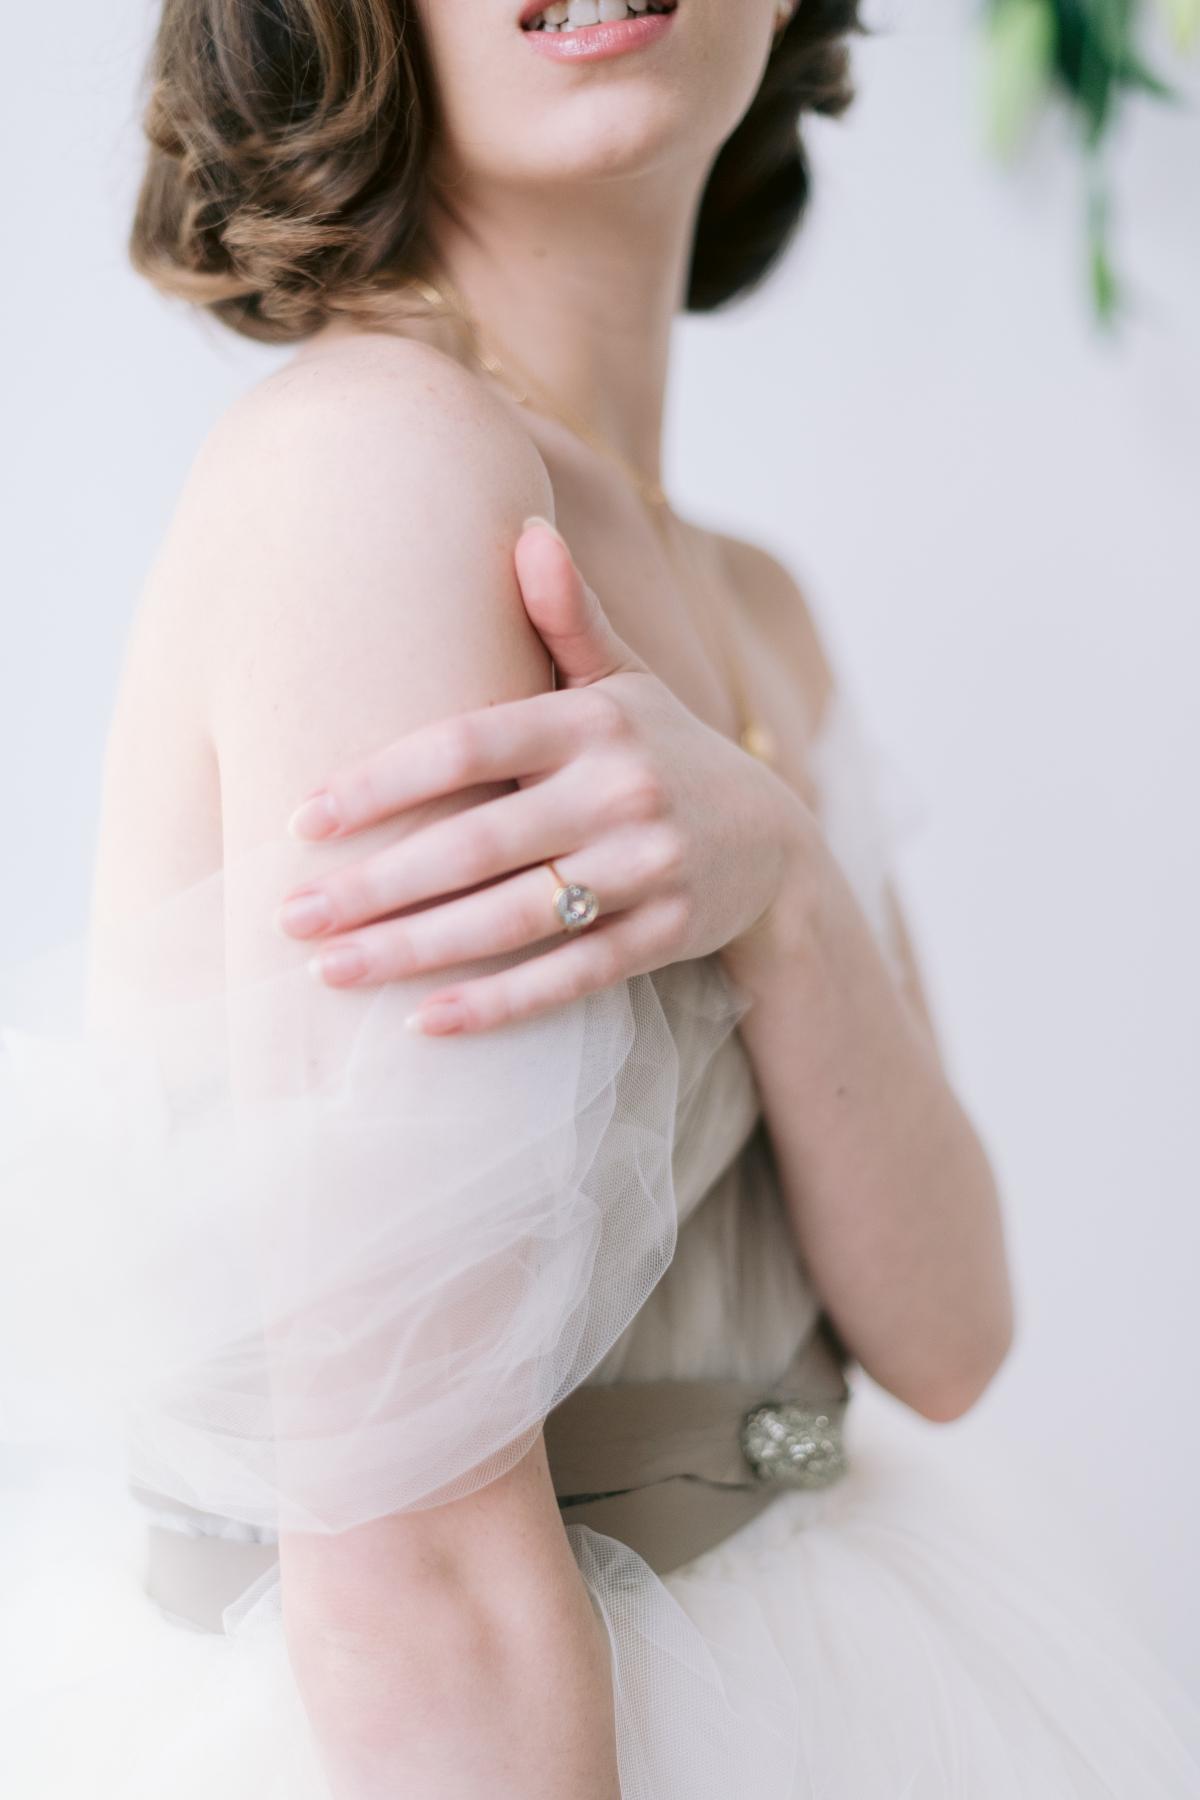 Laura Lanzerotte Bridal Danielle Heinson Photography 24